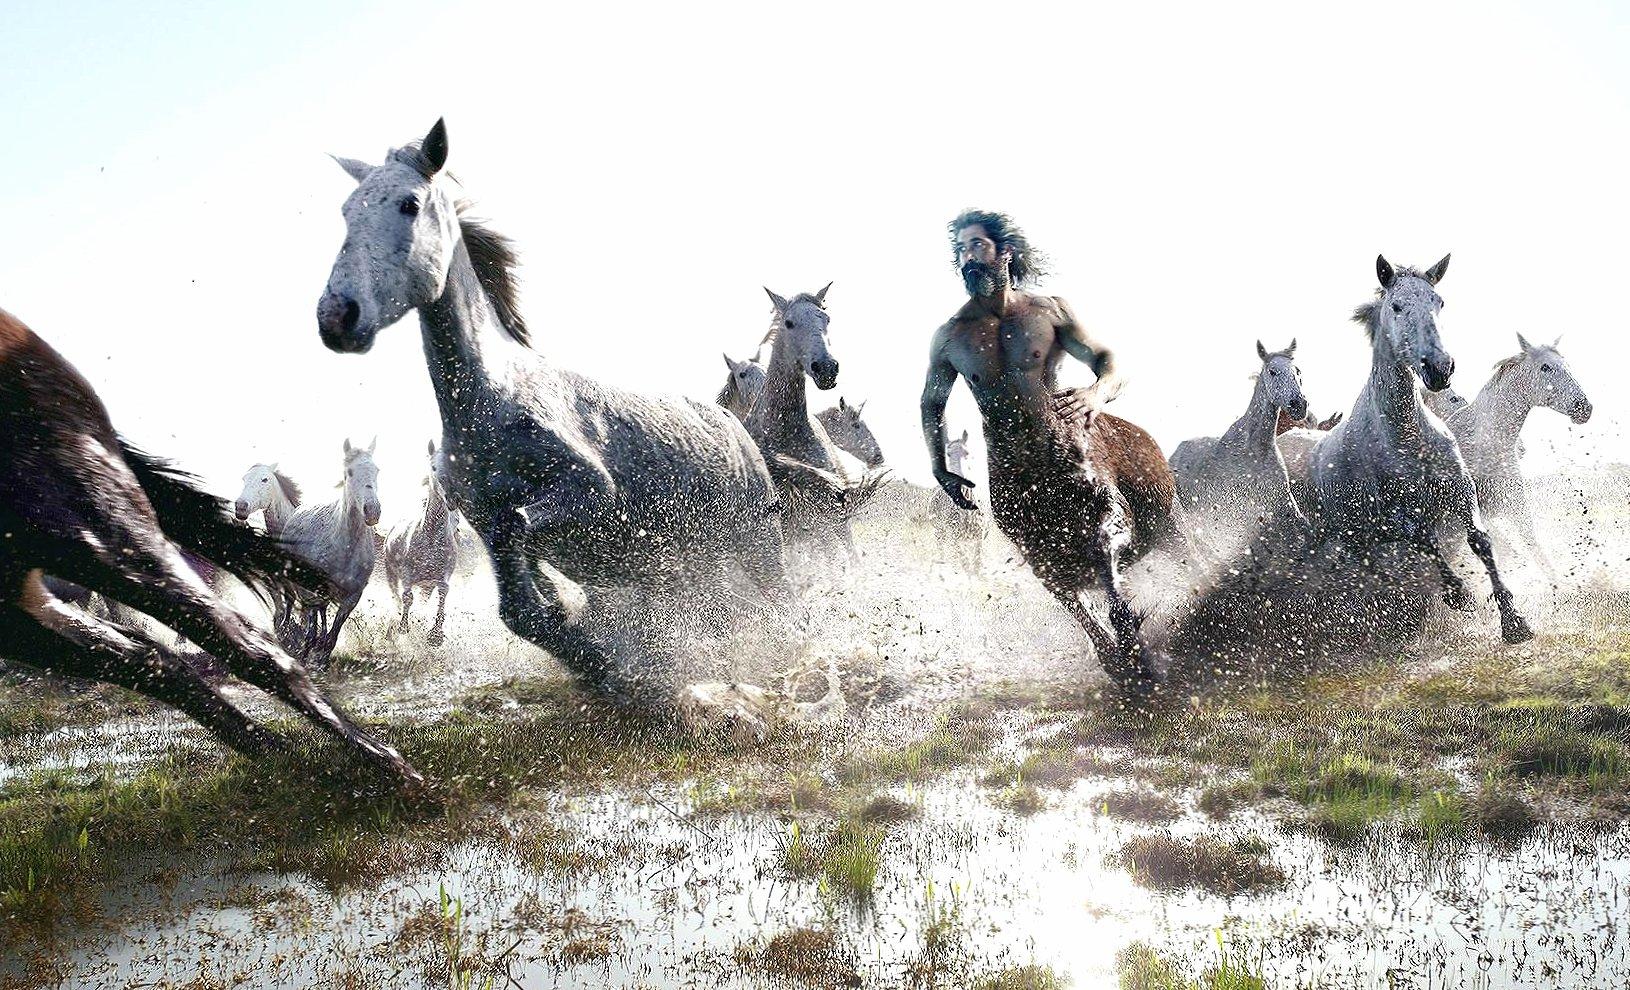 Horse and centaur running digital art wallpapers HD quality